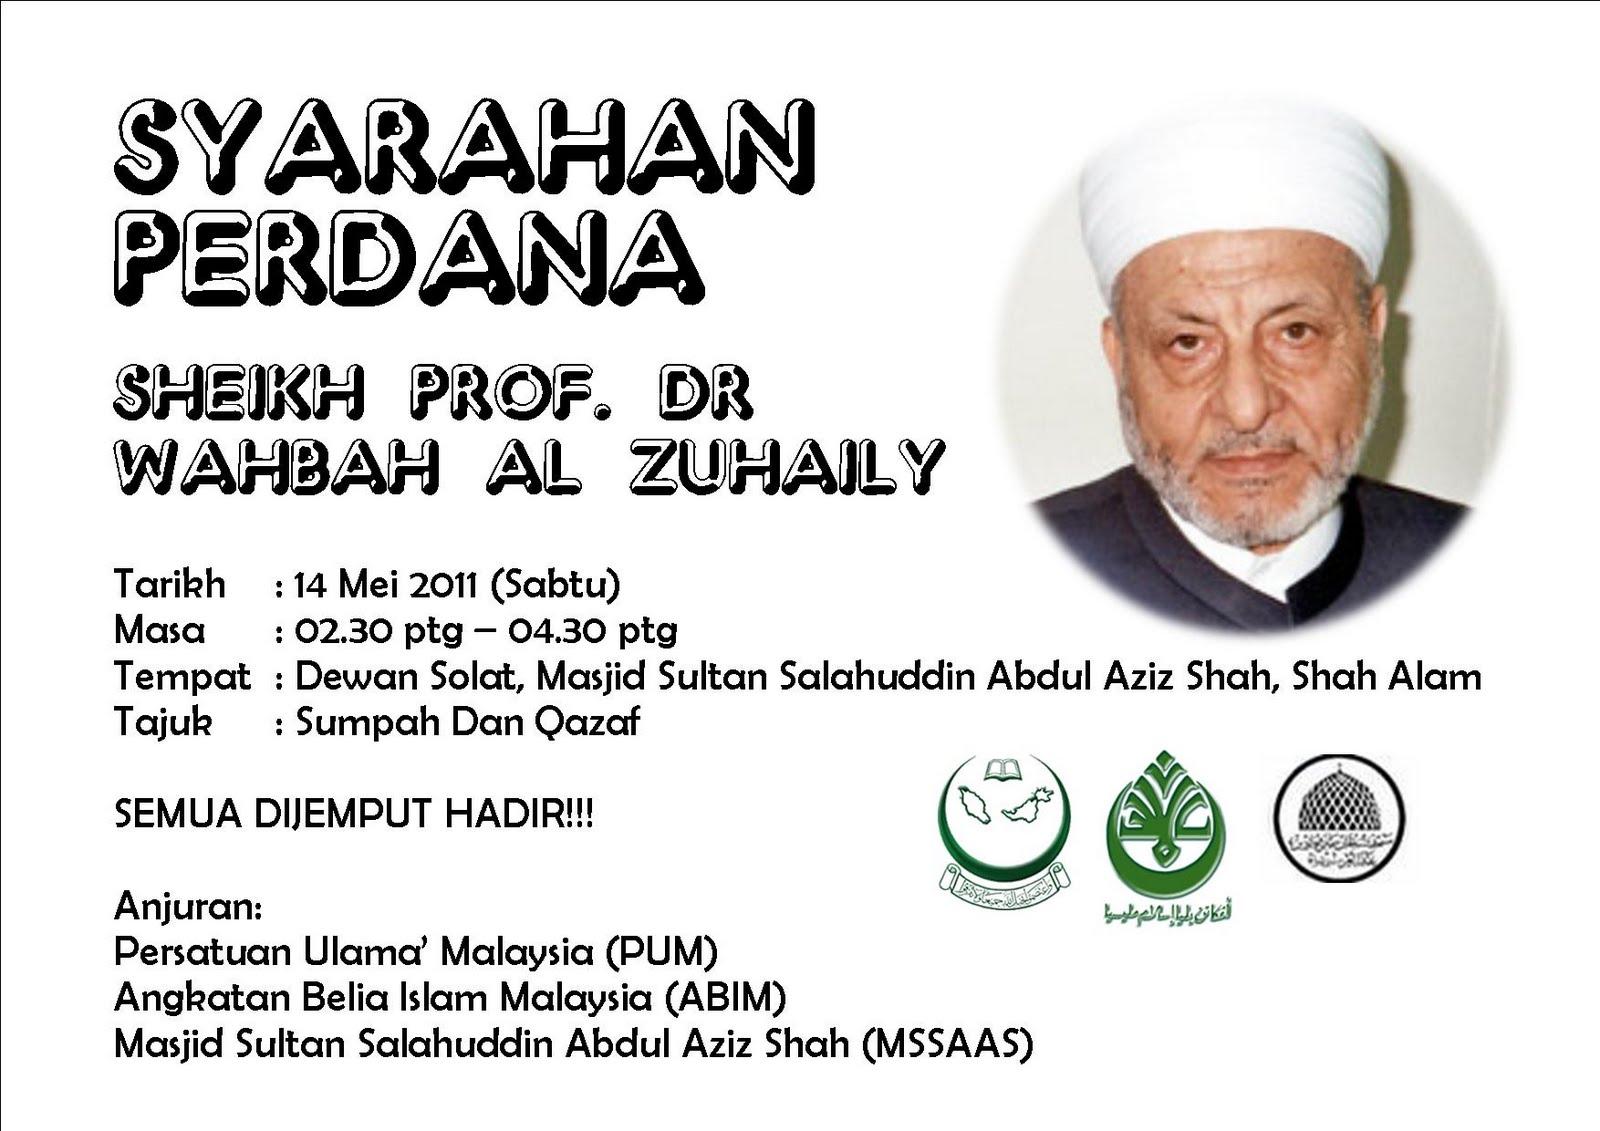 Syarahan Perdana Sheikh Wahbah Zuhaily www.mymaktabaty.com